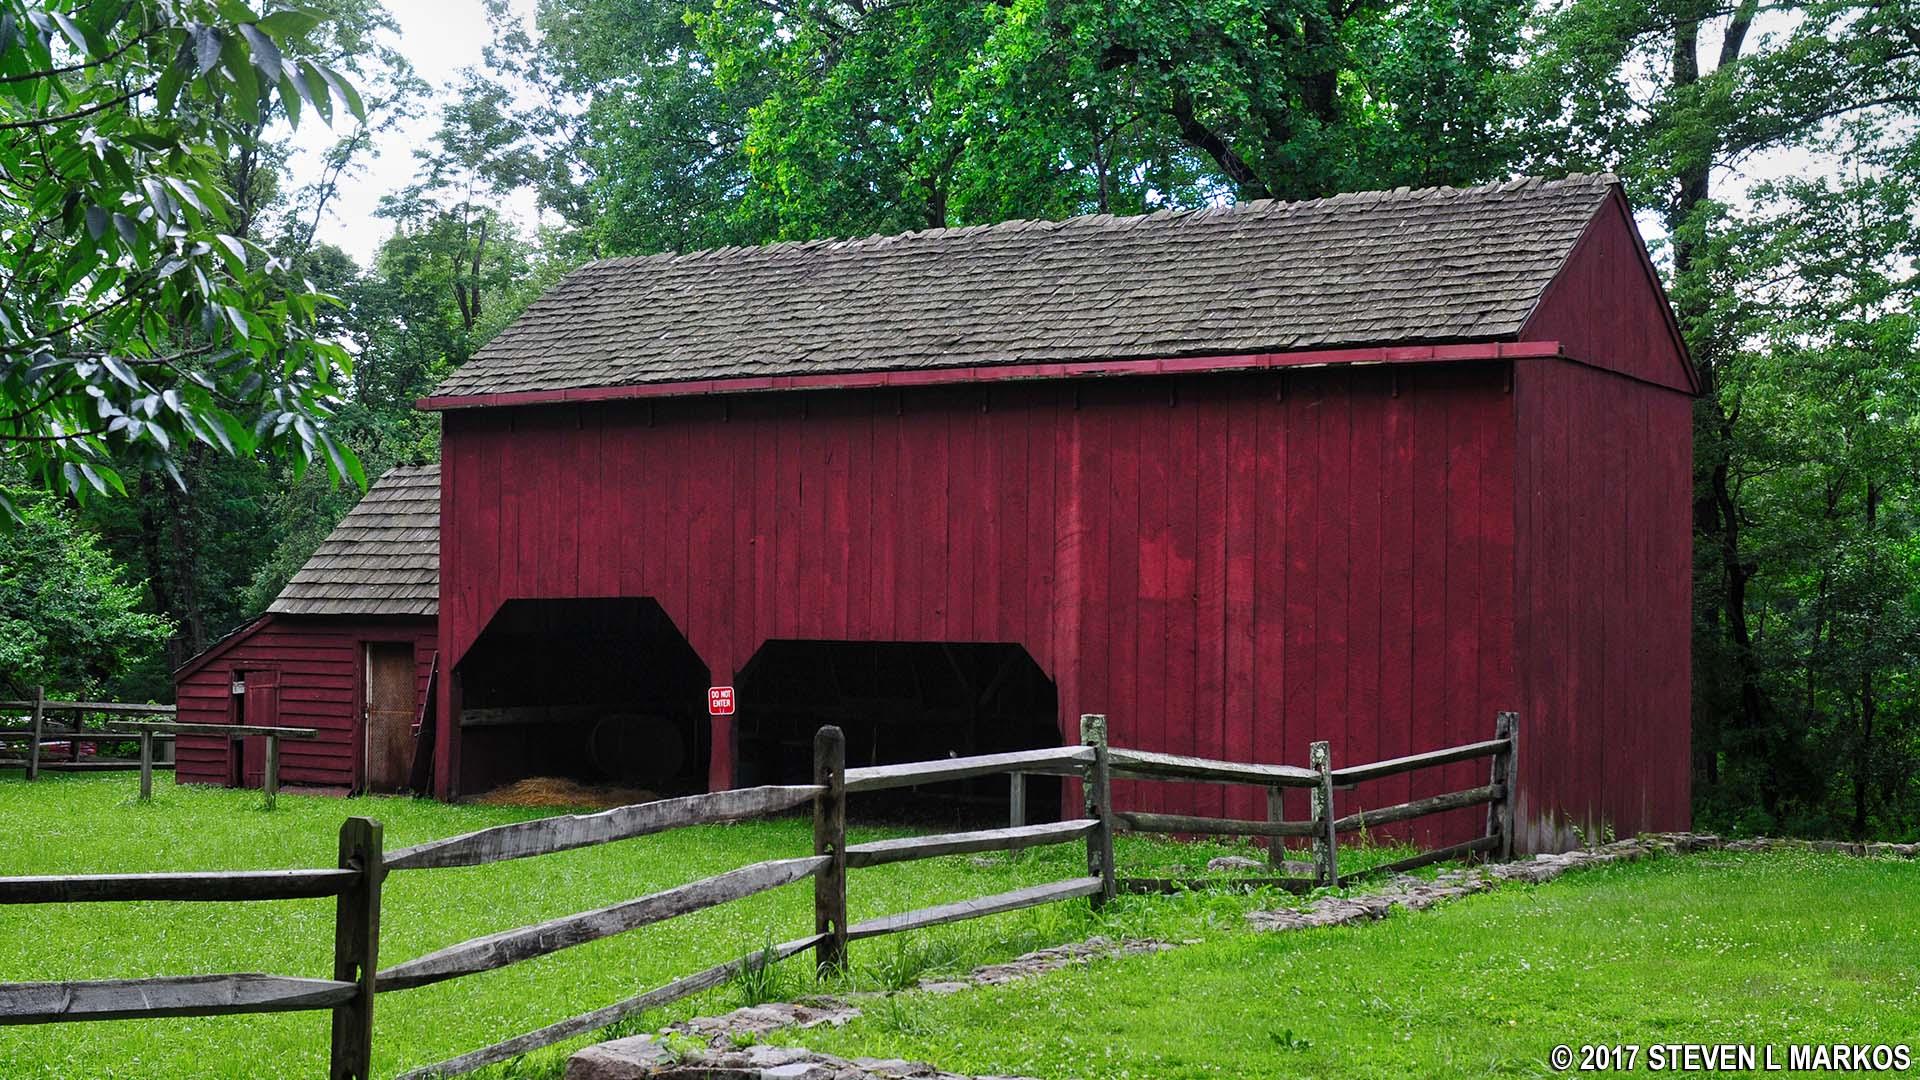 Barn At The Wick Farm